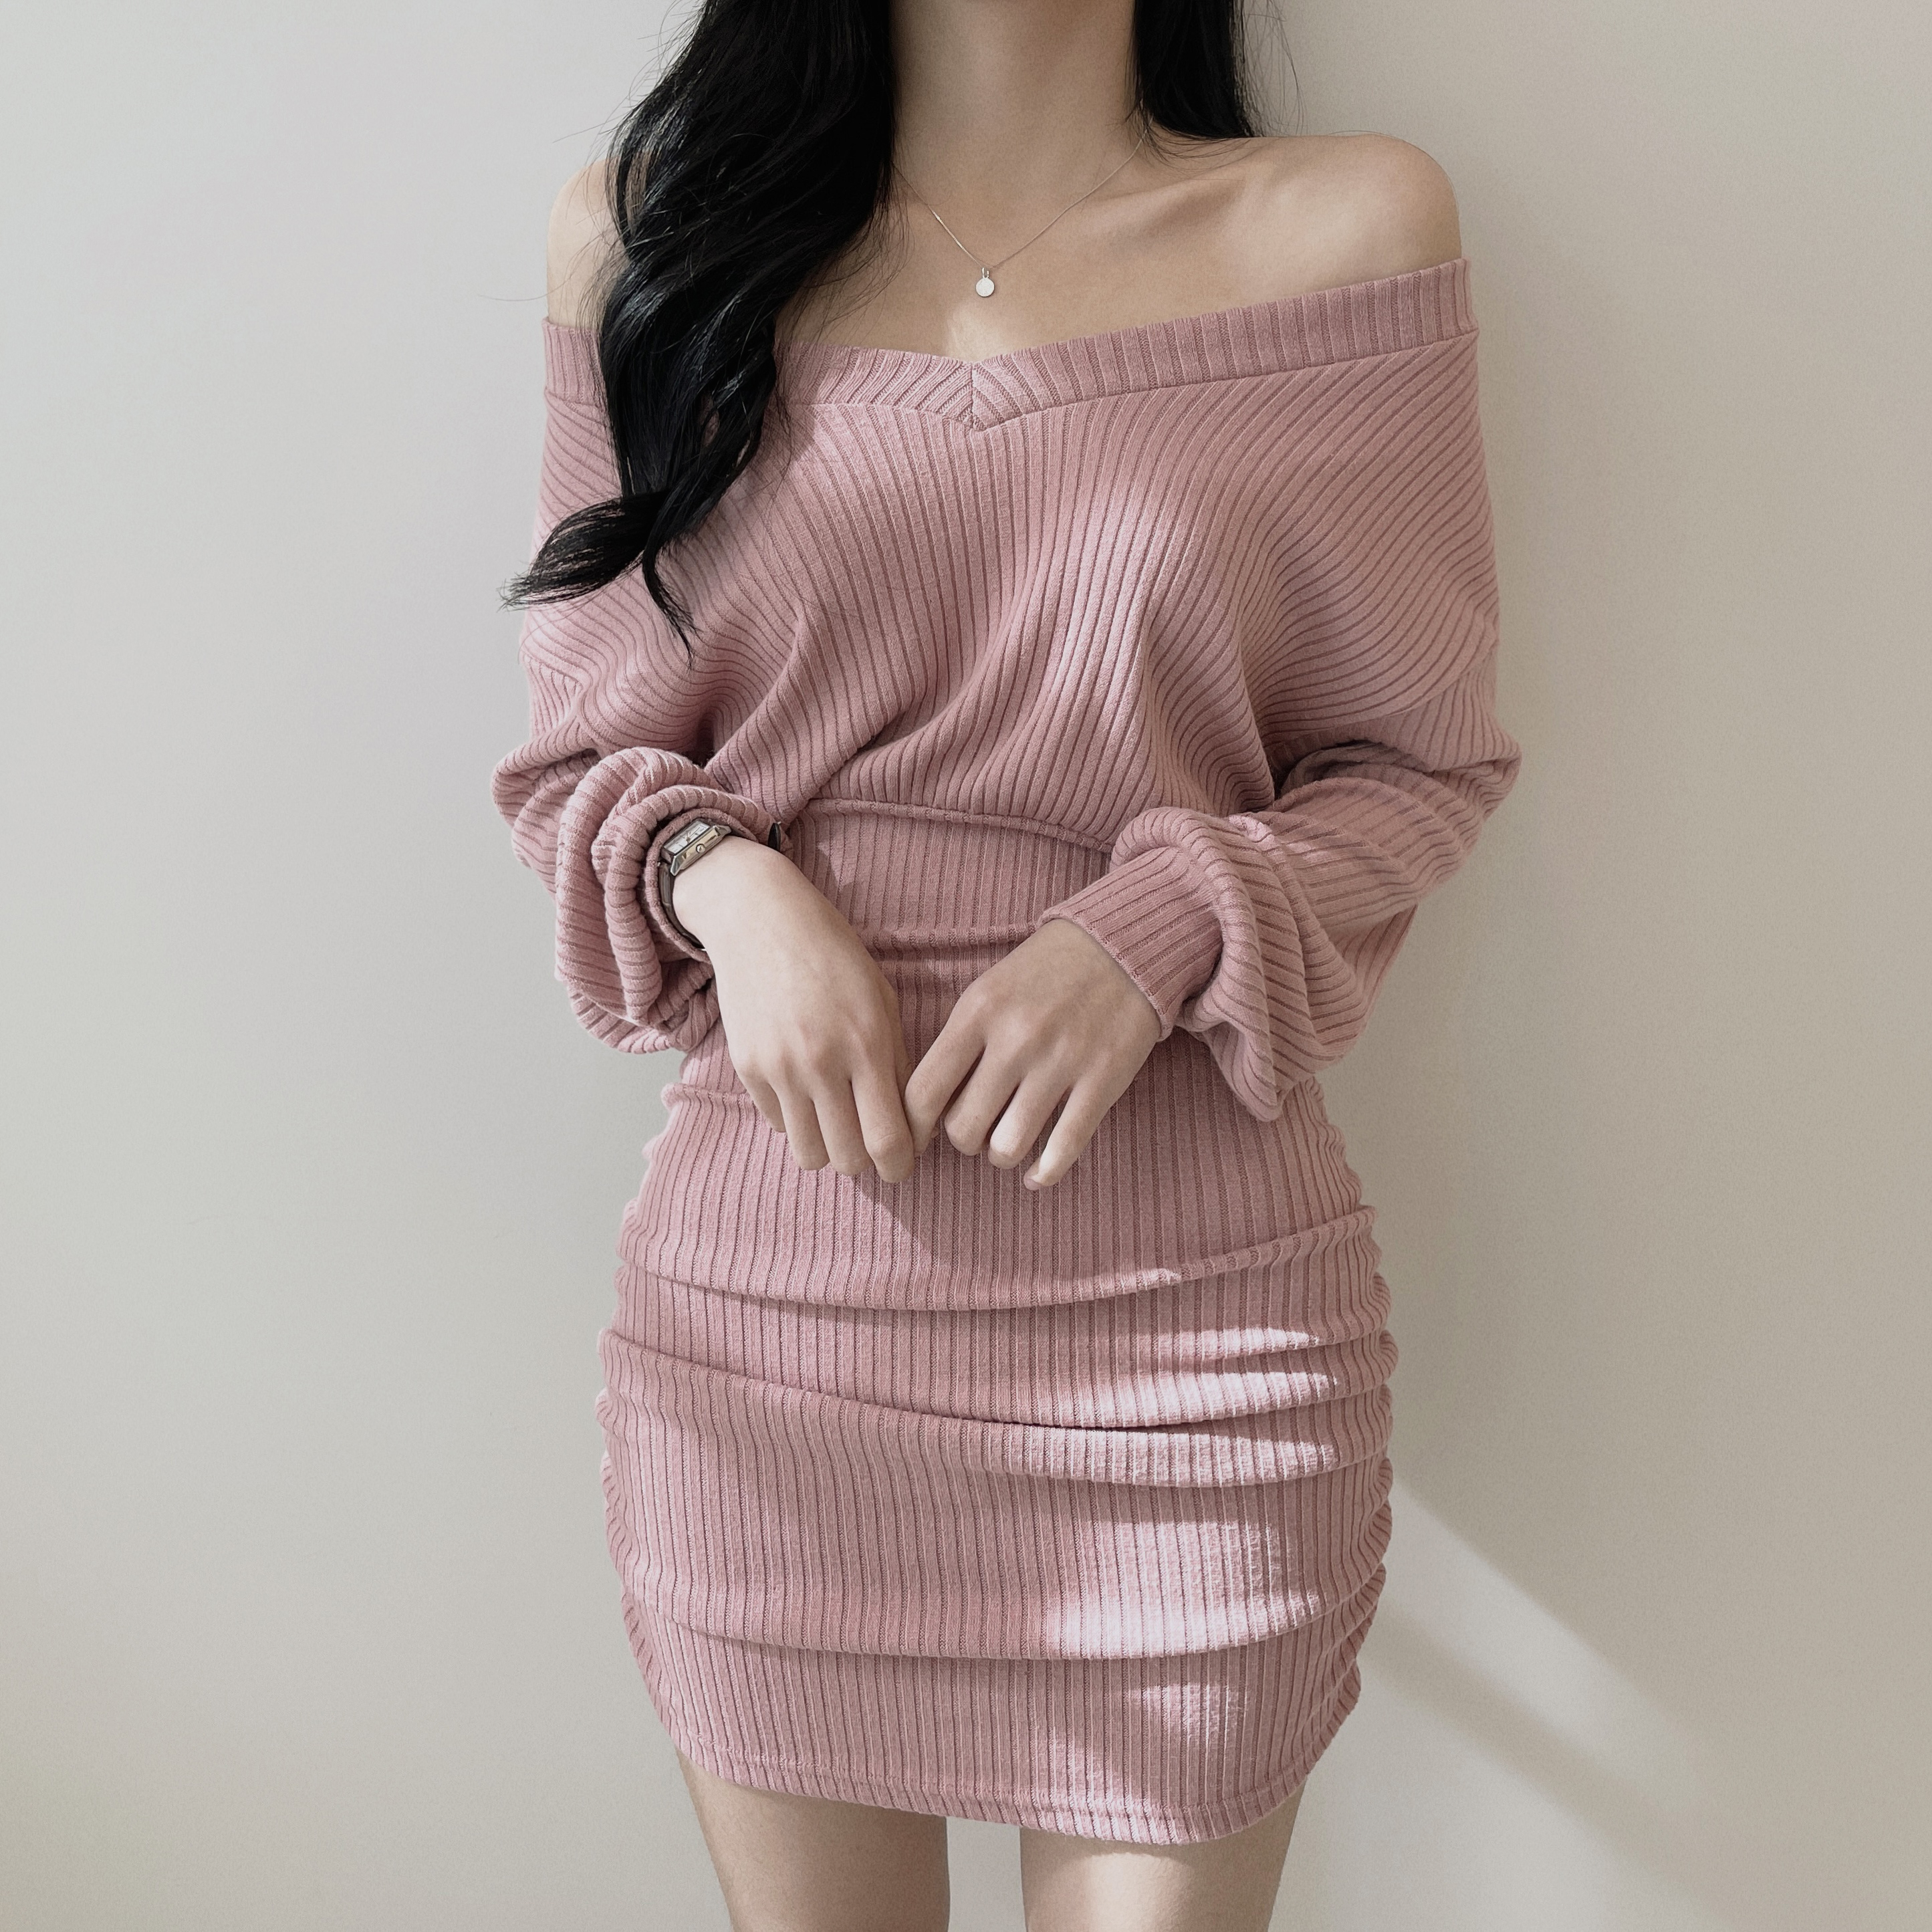 Peach V-Neck Shirring Knitwear Mini Dress